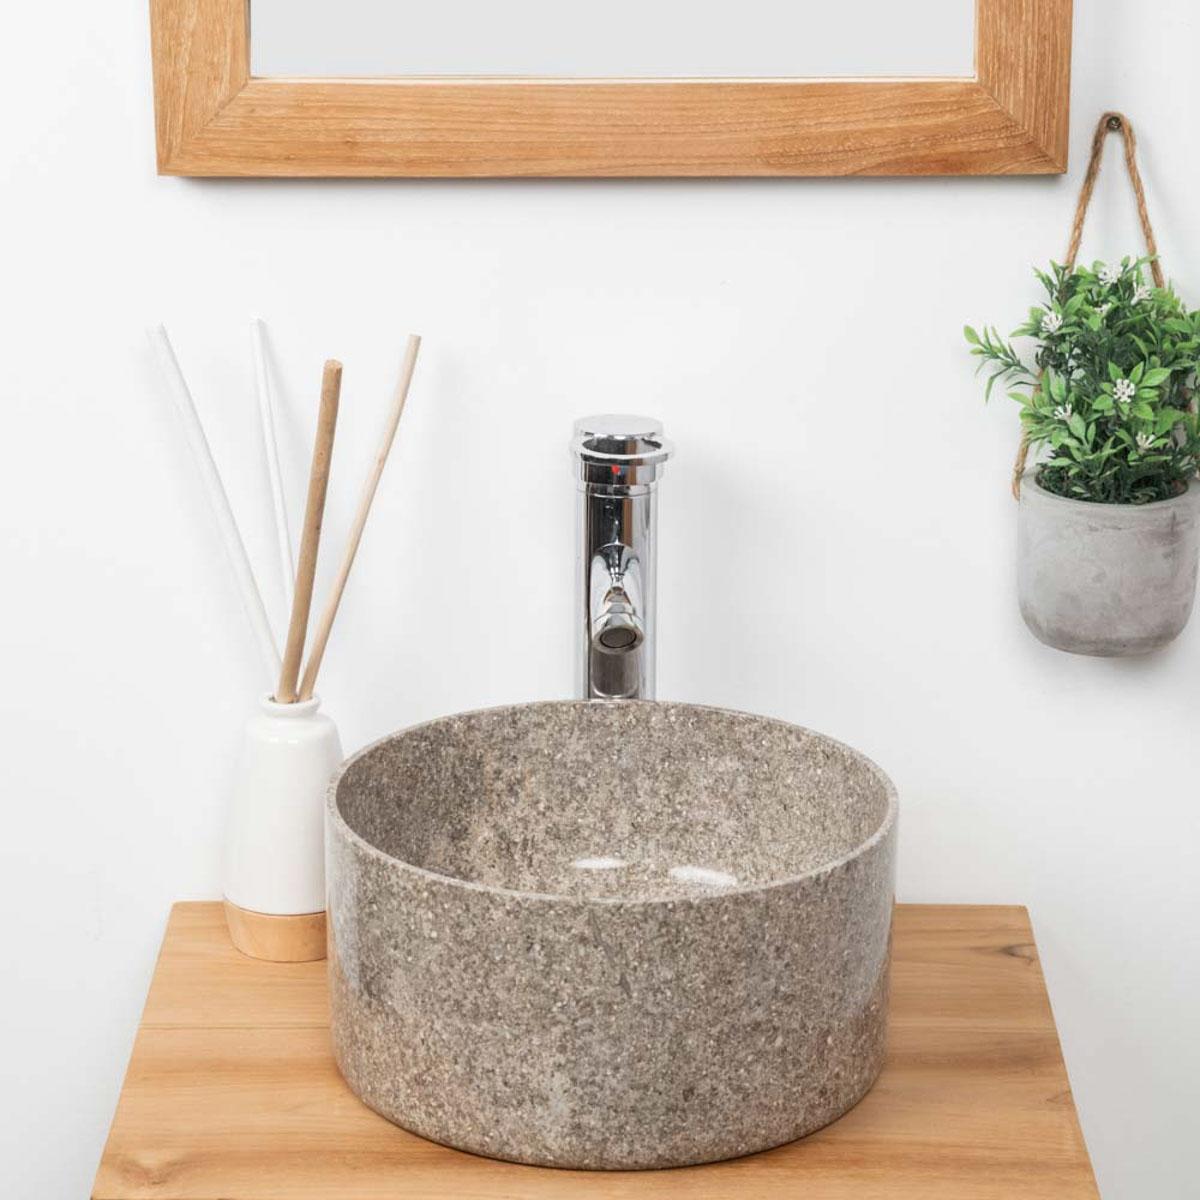 Les articles du site de wanda collection - Vasque salle de bain ronde ...